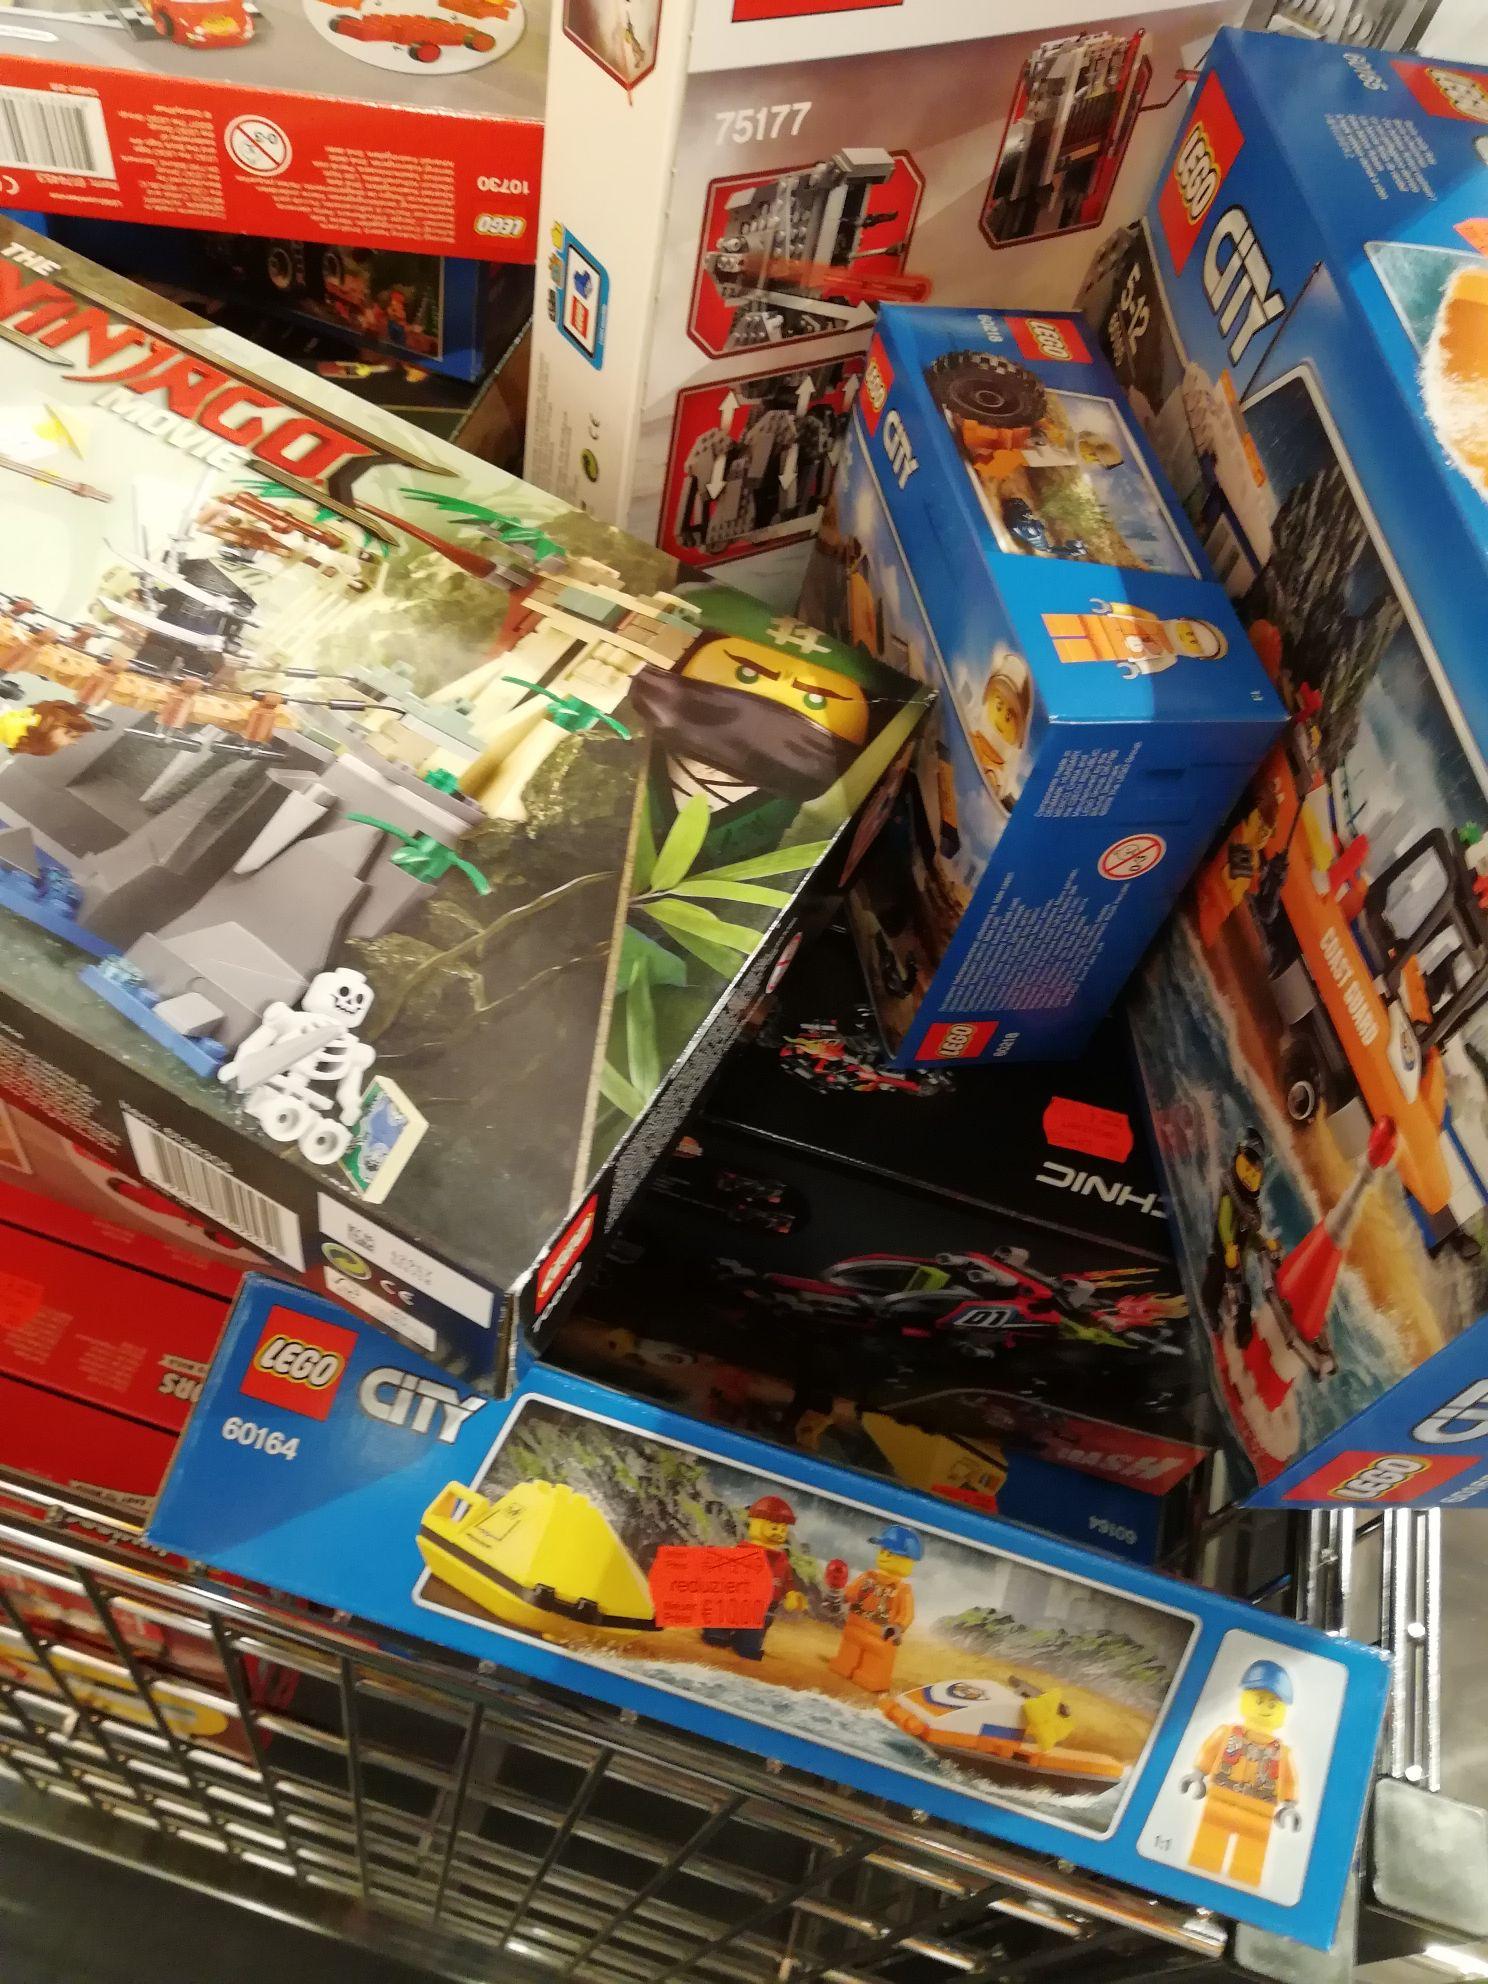 Lego 50% [lokal hit Weinheim] Star Wars / Ninjago / friends / city...